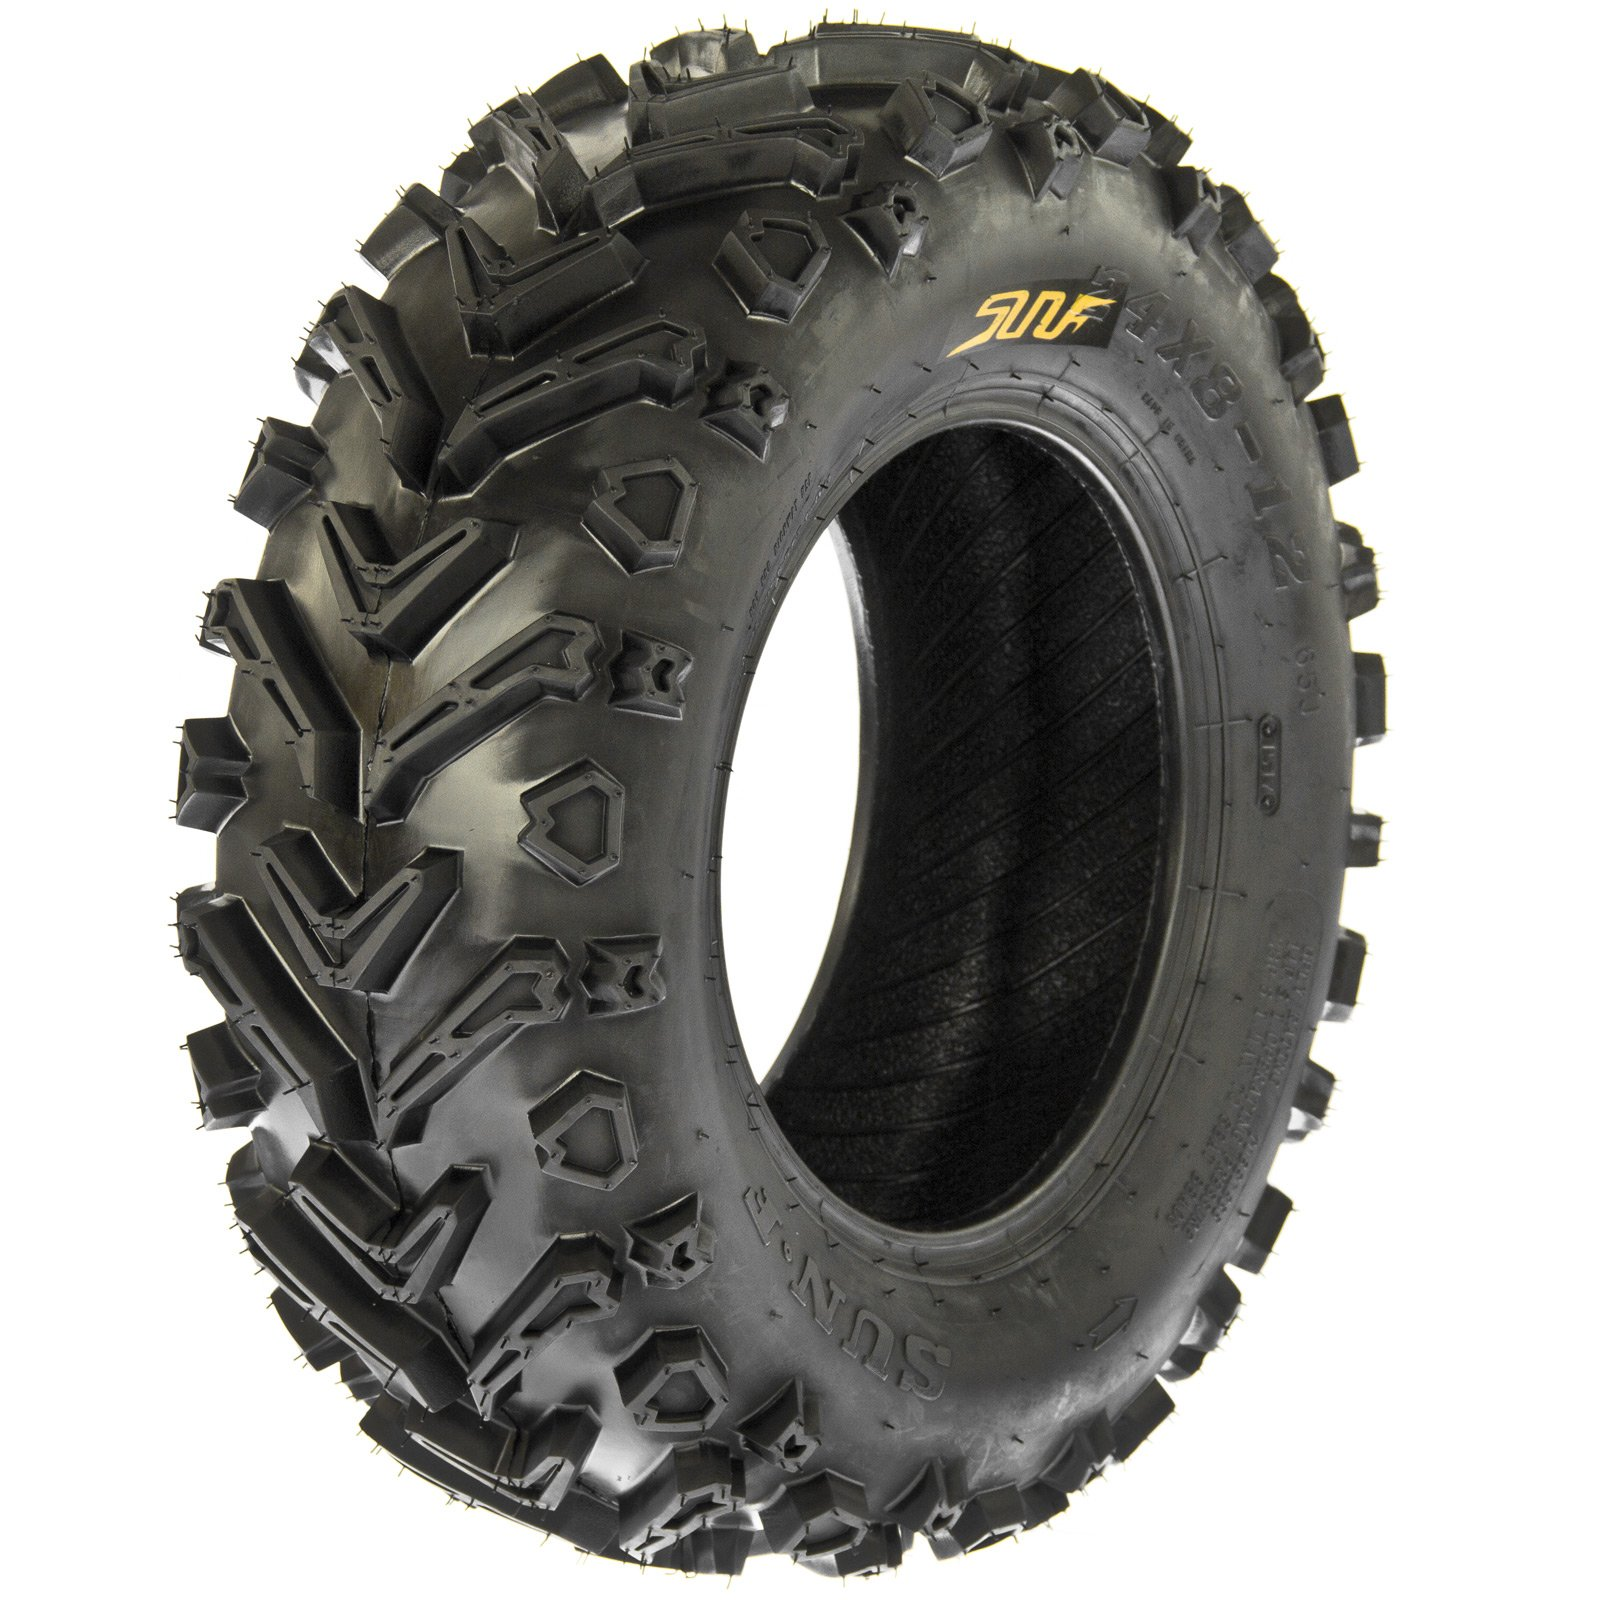 SunF A041 Mud|Trail ATV/UTV Tire 24x8-12 , 6-PR by SunF (Image #1)